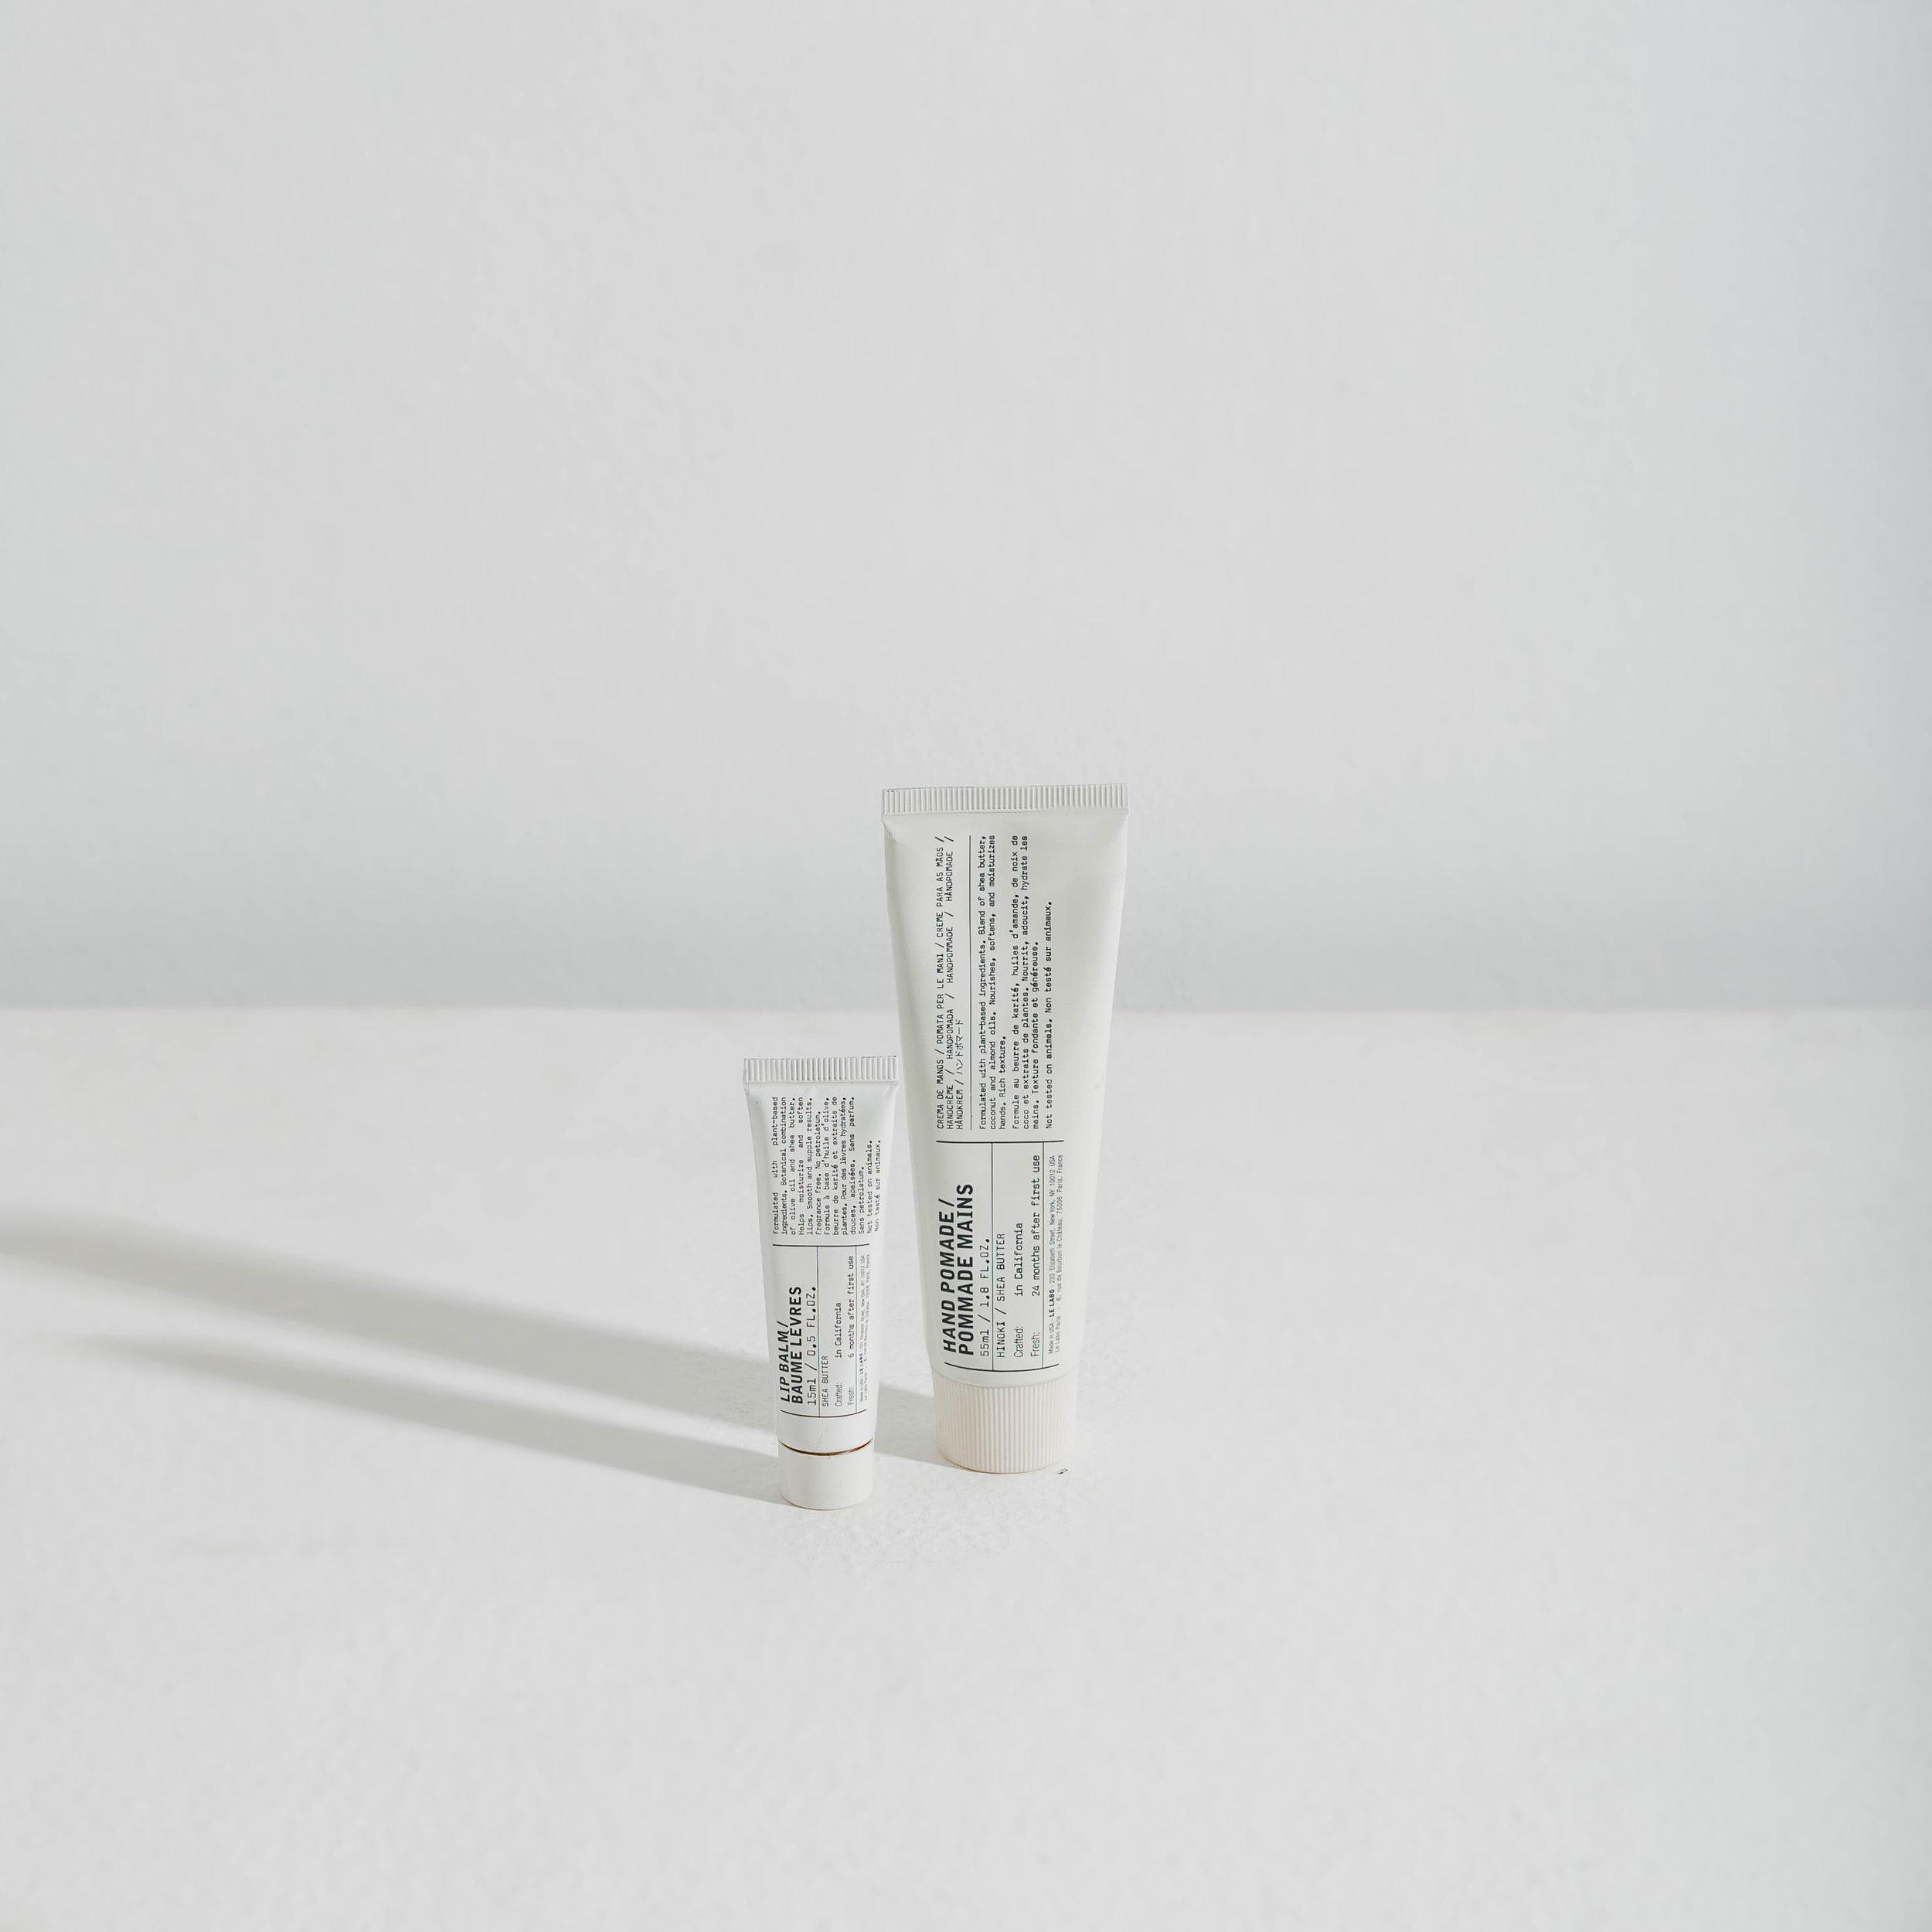 6. LE LABO Hand Pomade & Lip Balm